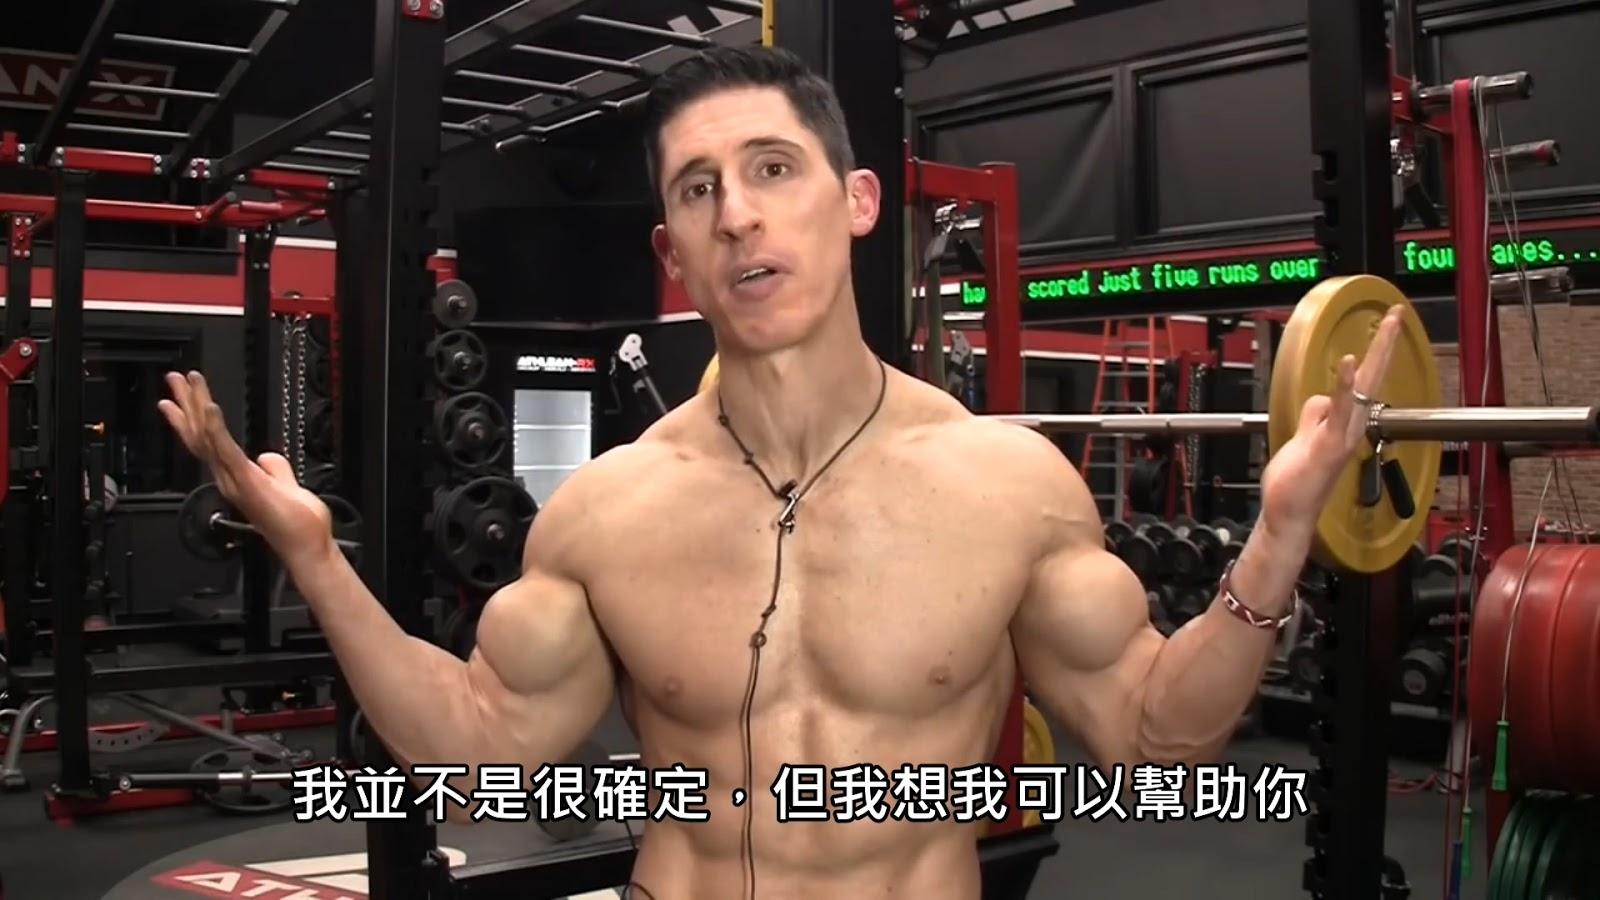 Fitting Room TW: 為什麼你的二頭肌沒有成長 (中文字幕)